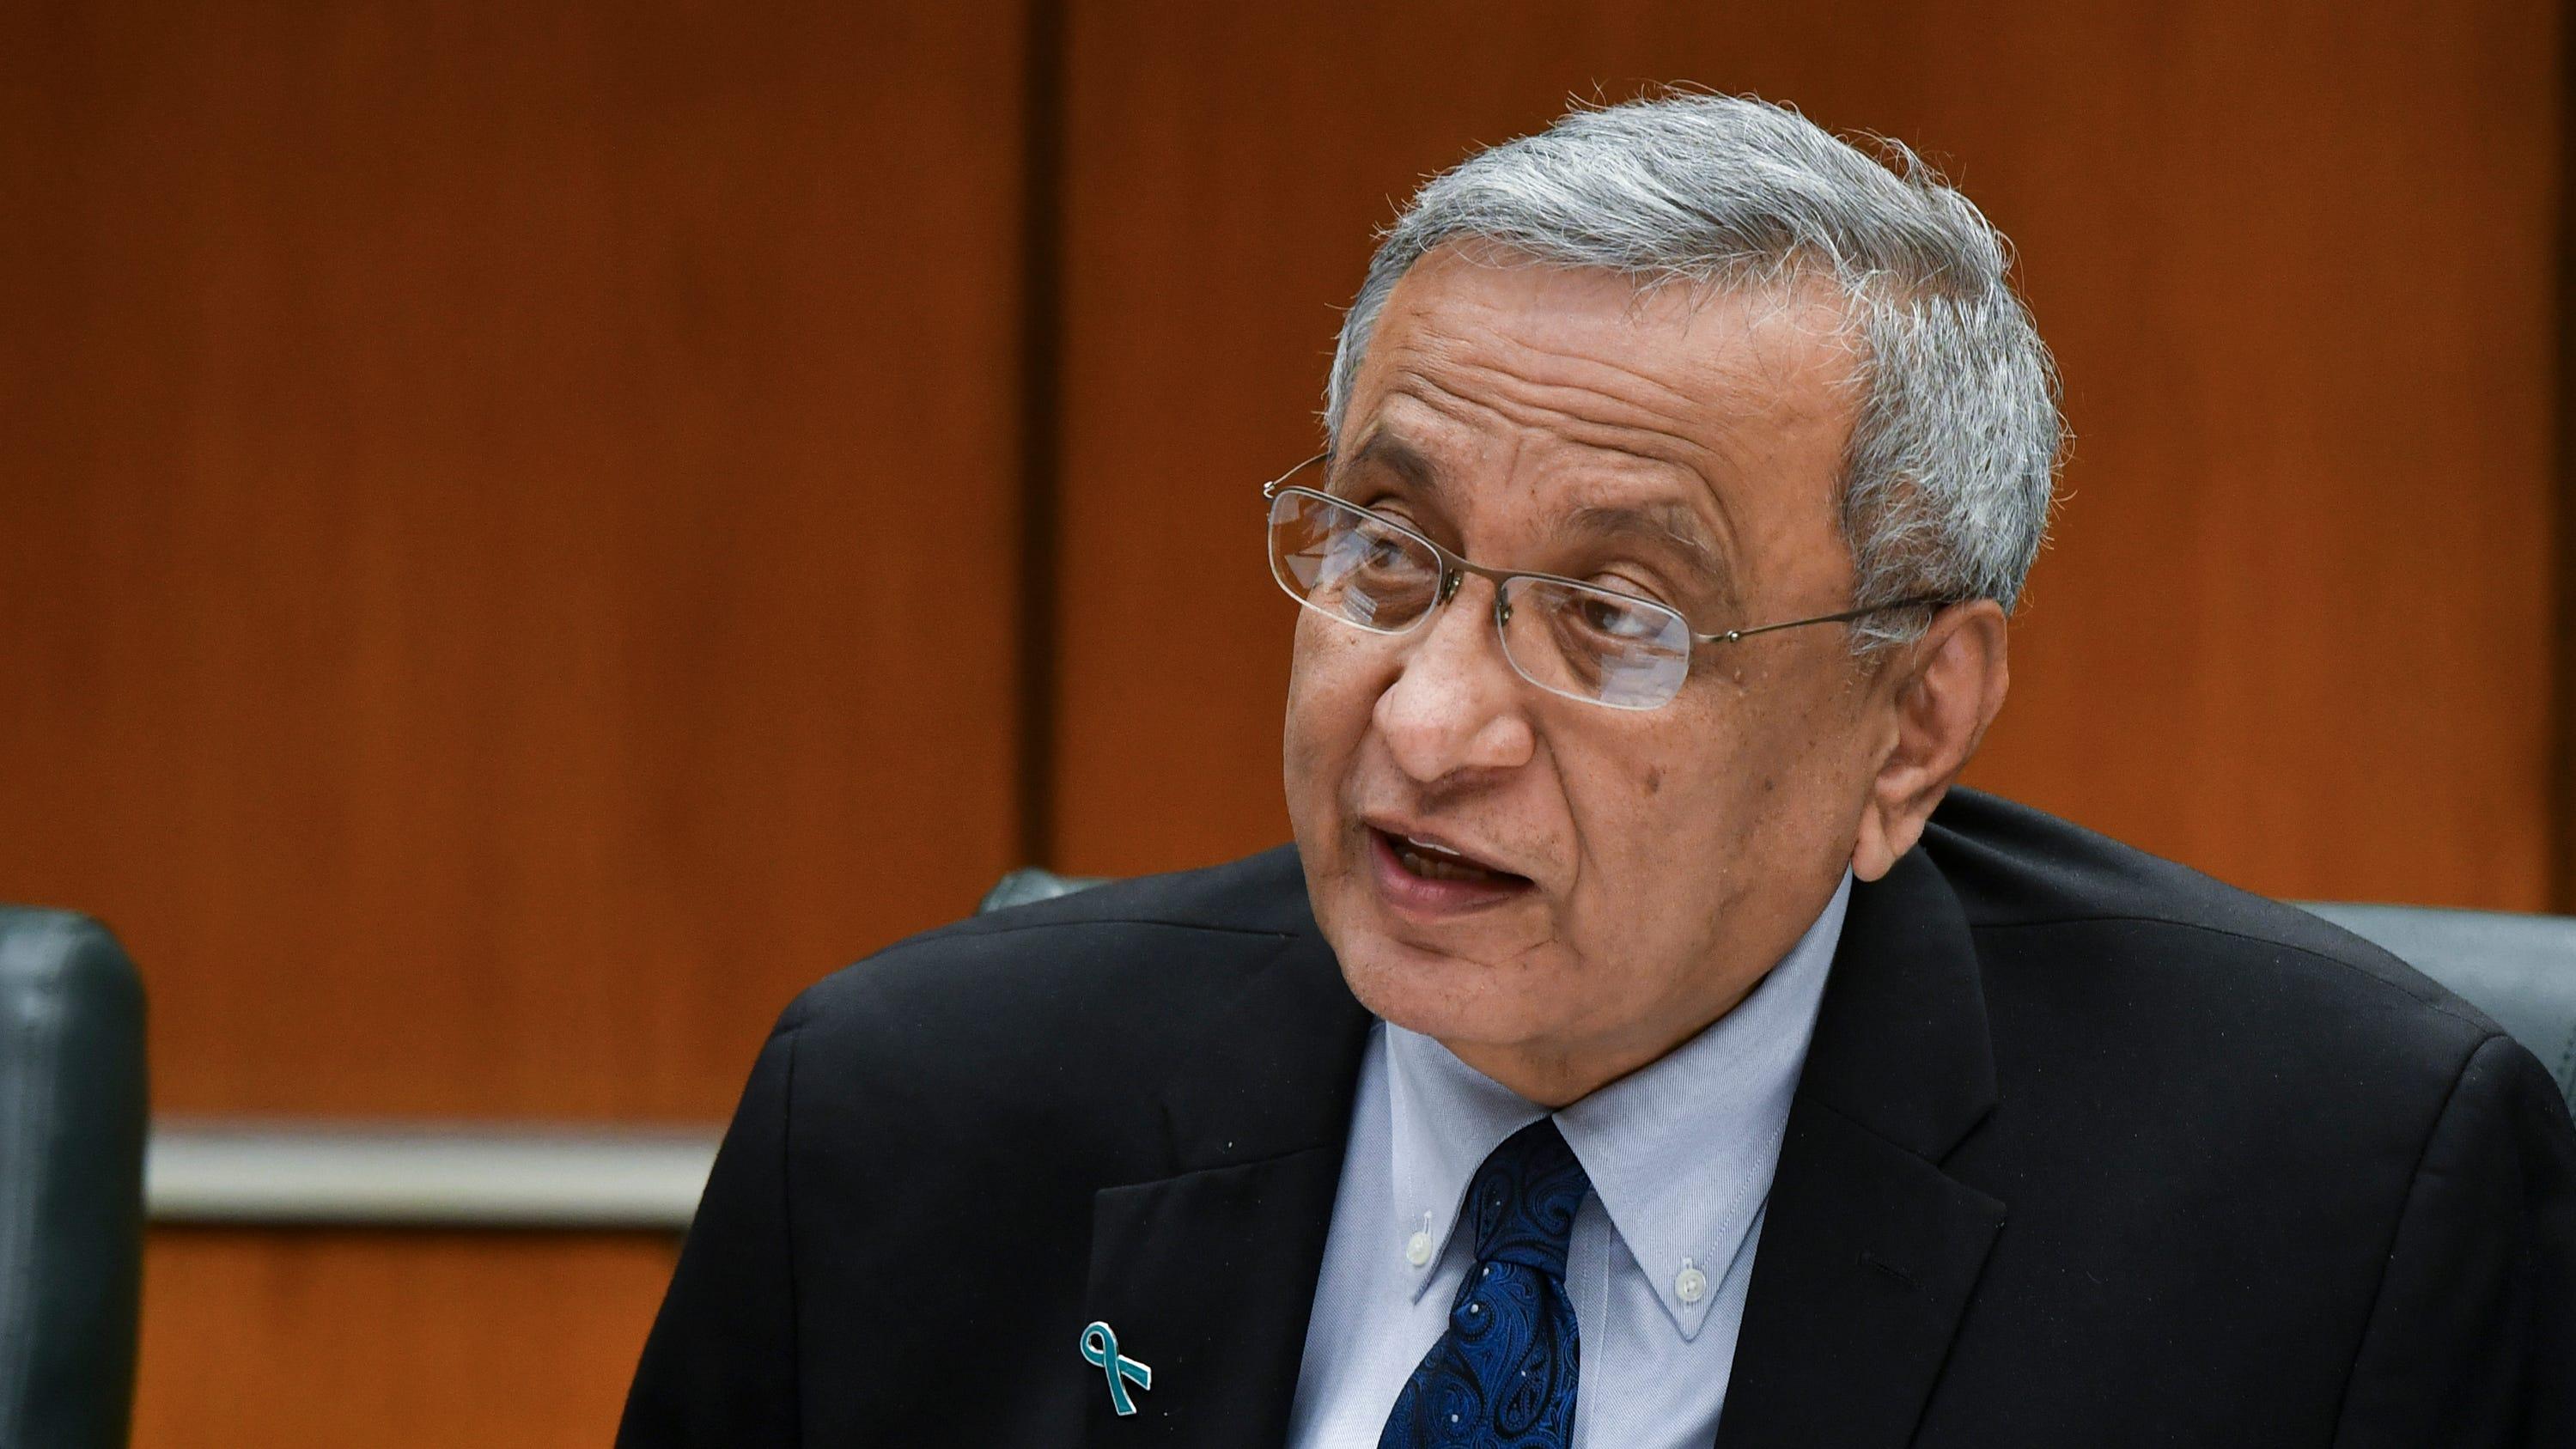 MSU interim President apologizes to Nassar victims